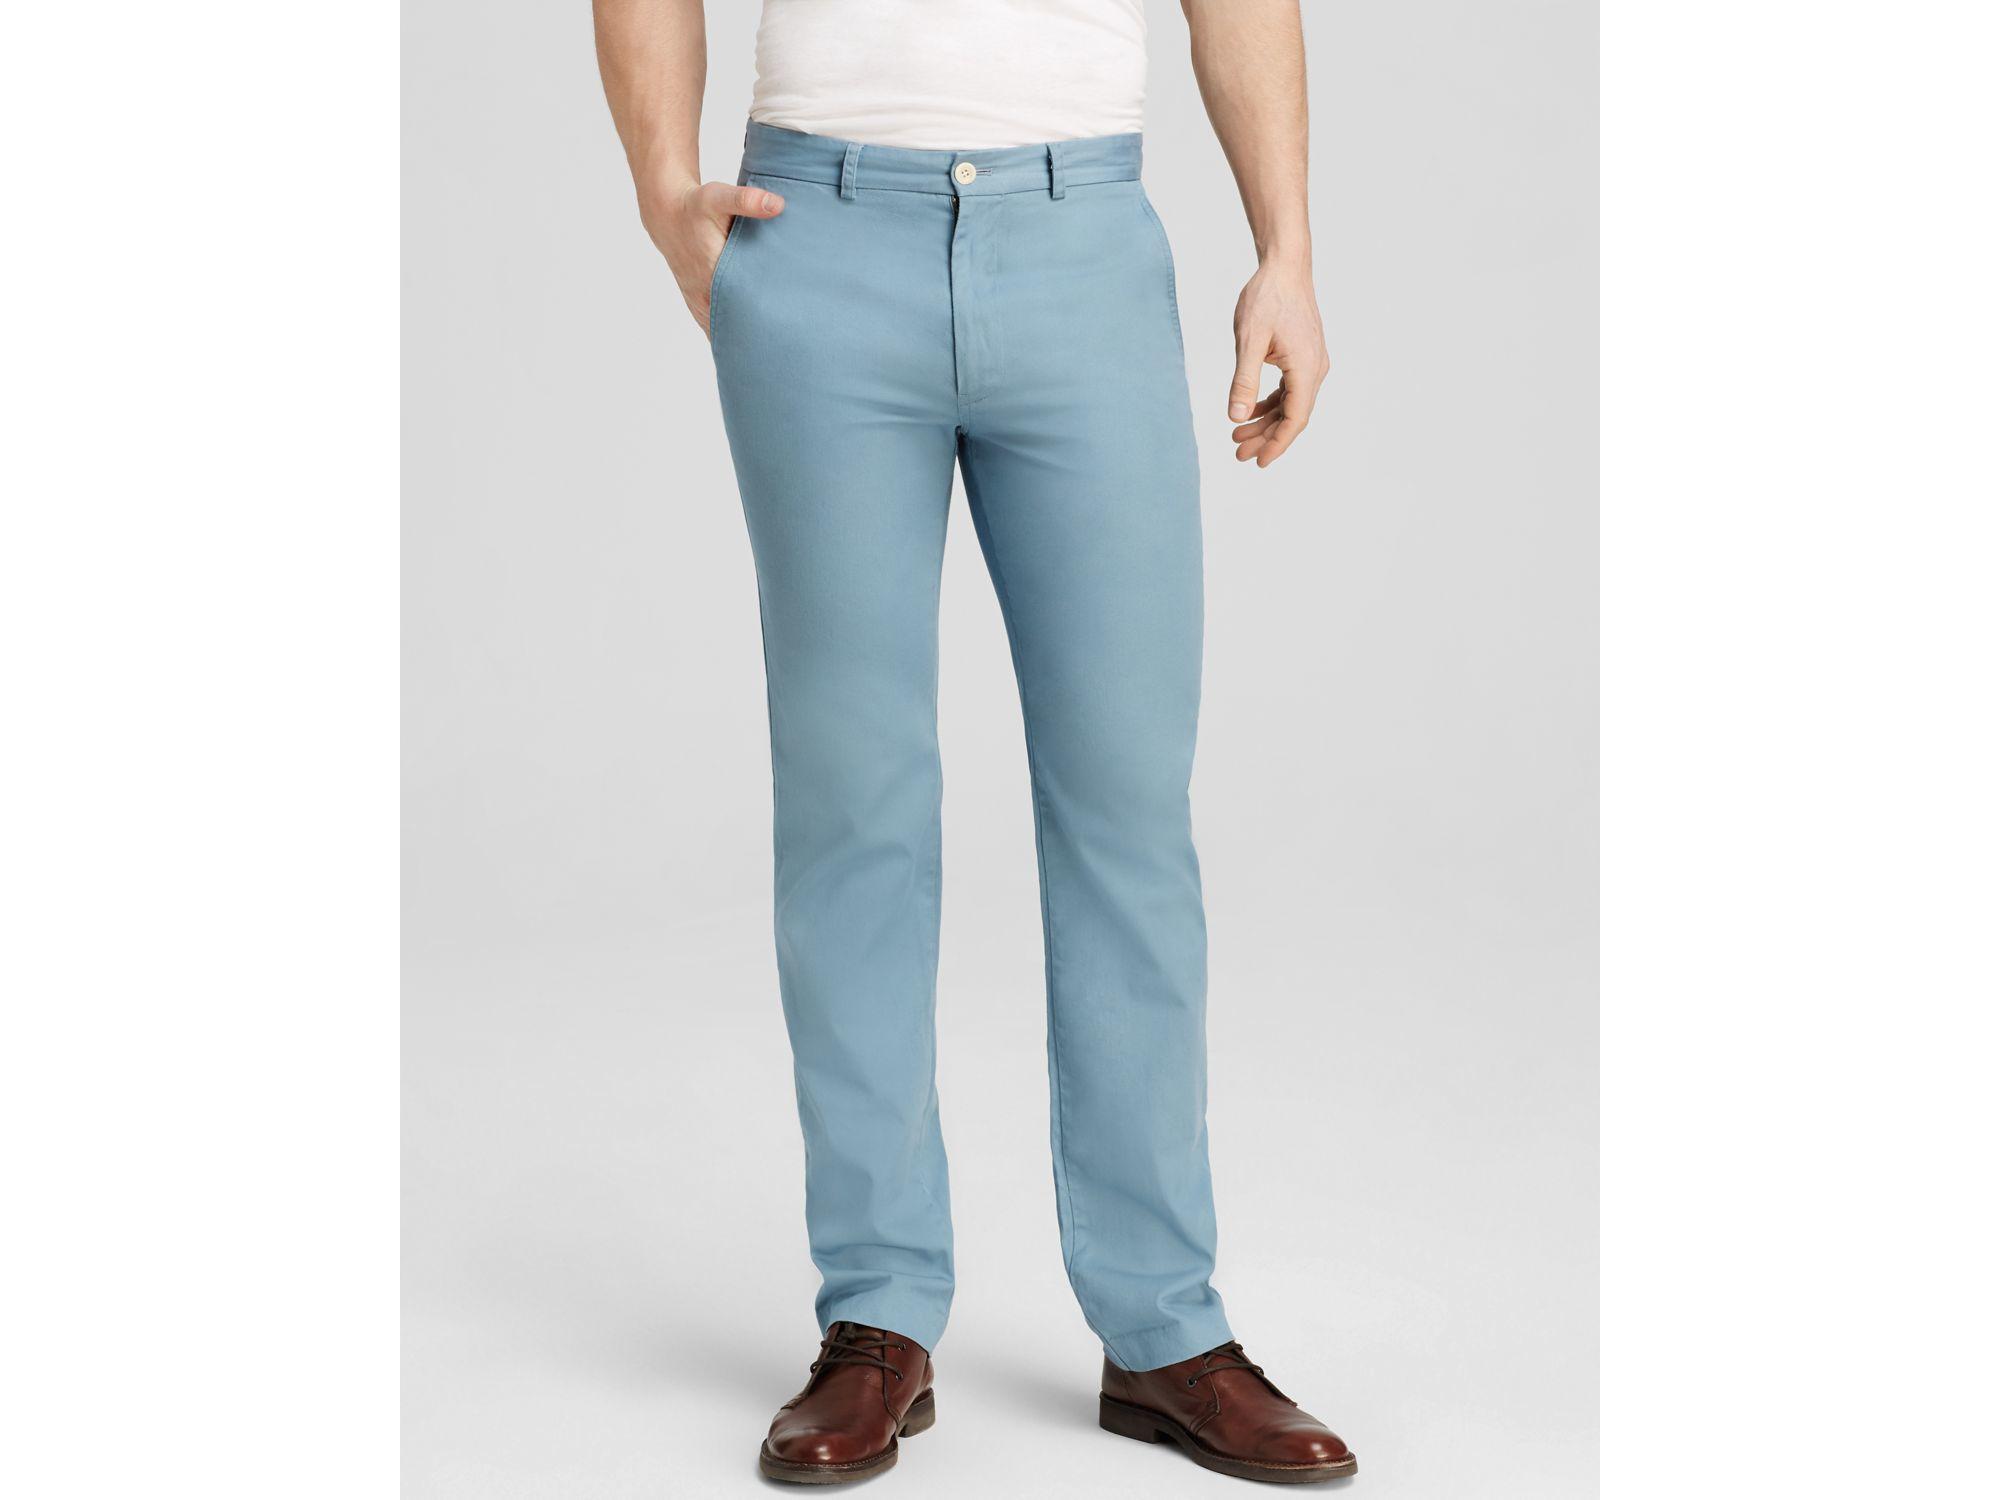 Pantalons - Shorts Freemans Sporting Club QGTcC4kO7